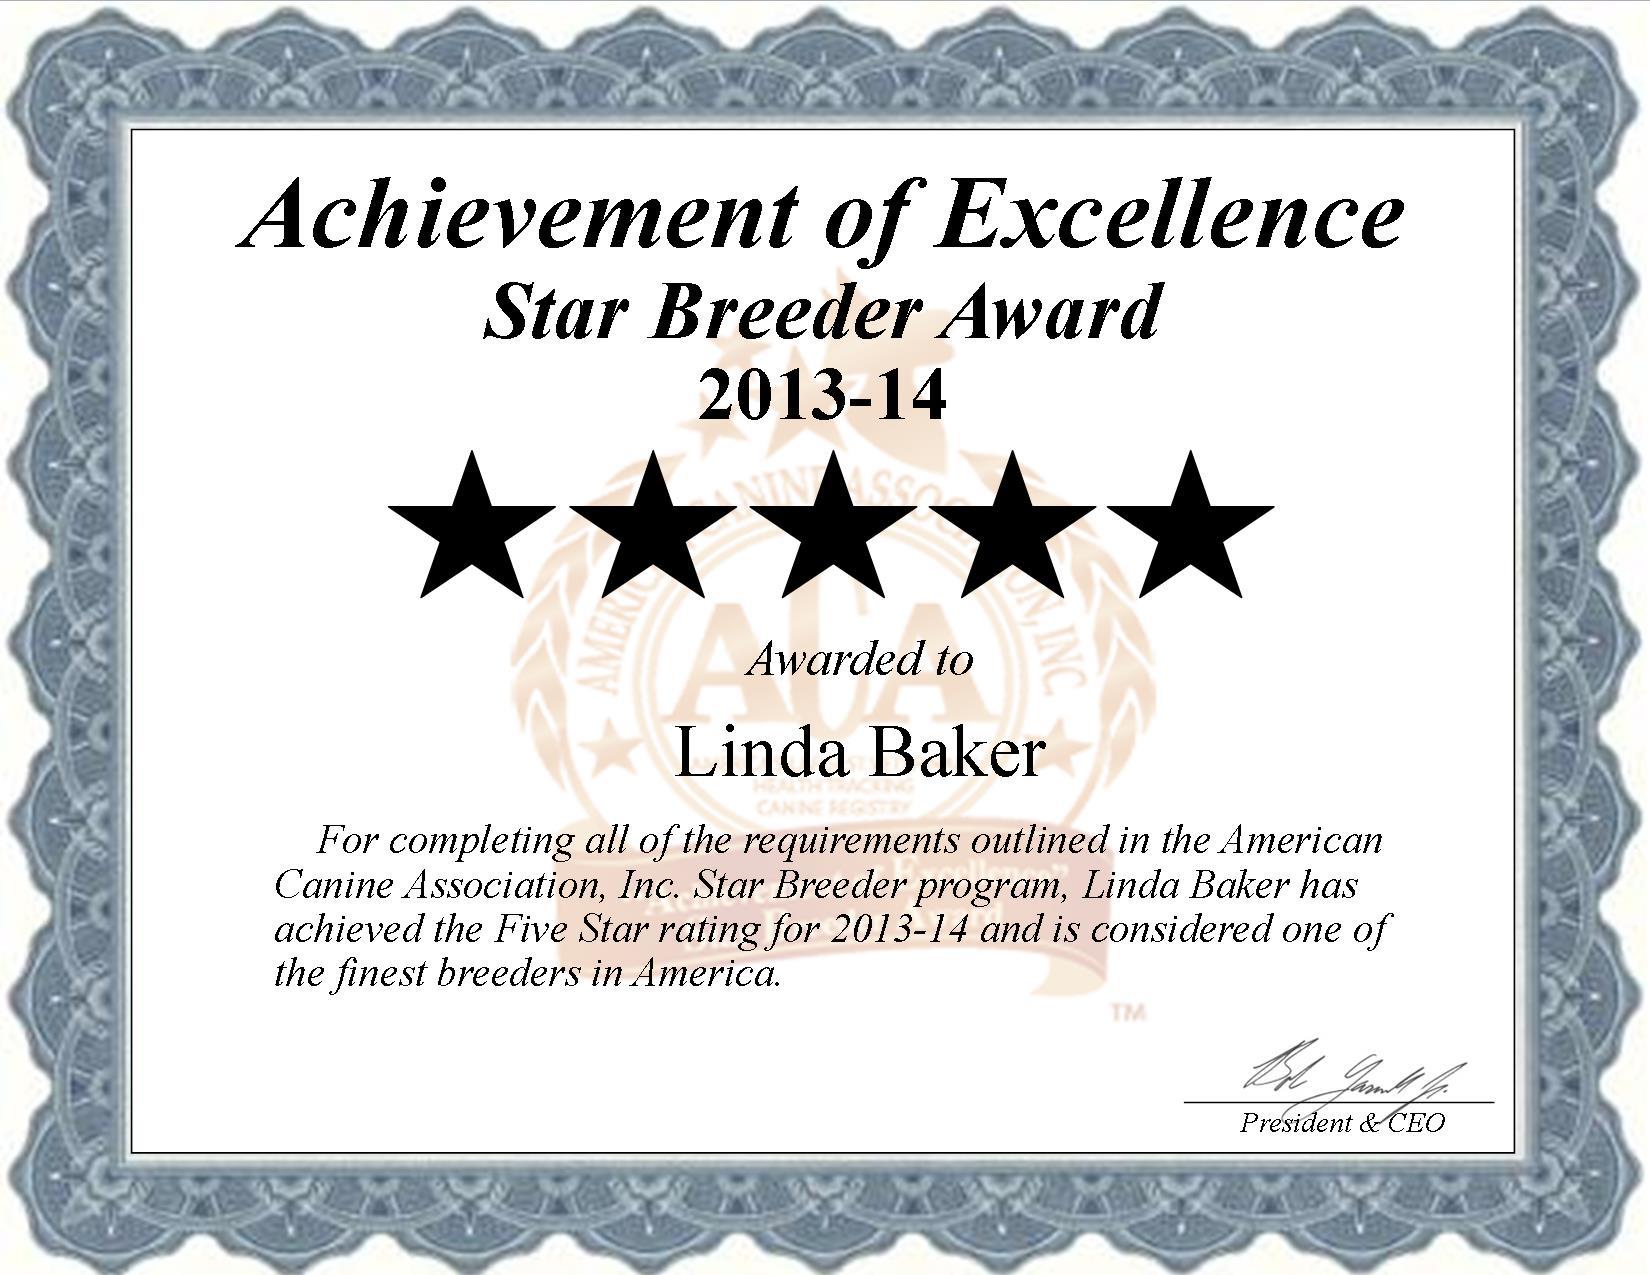 Linda, Baker, Linda Baker, Baker Kennel, breeder, star breeder, aca, star breeder, 5 star, ketchum, oklahoma, ok, dog, puppy, puppies, star breeders, ok breeder, linda baker breeder, starbreeder, starbreeders, aca star